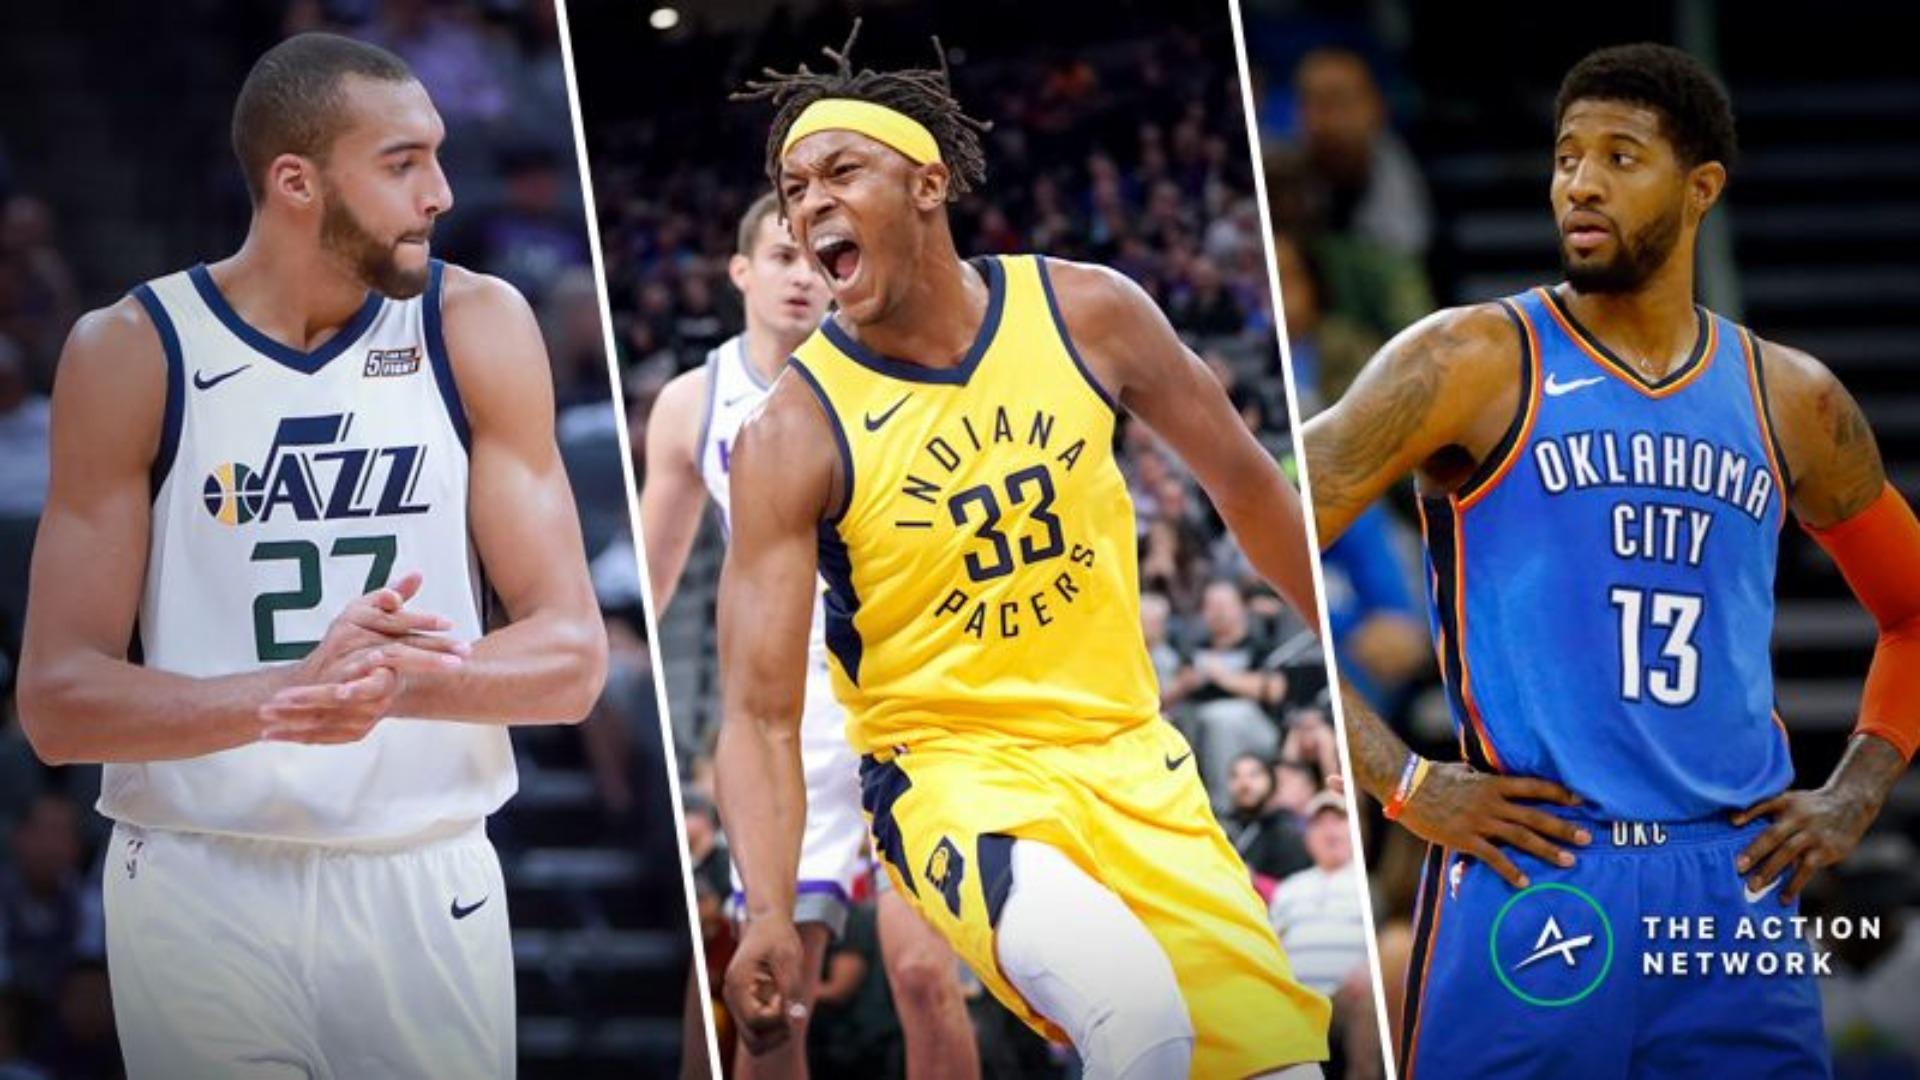 Kia NBA Defensive Player of the Year